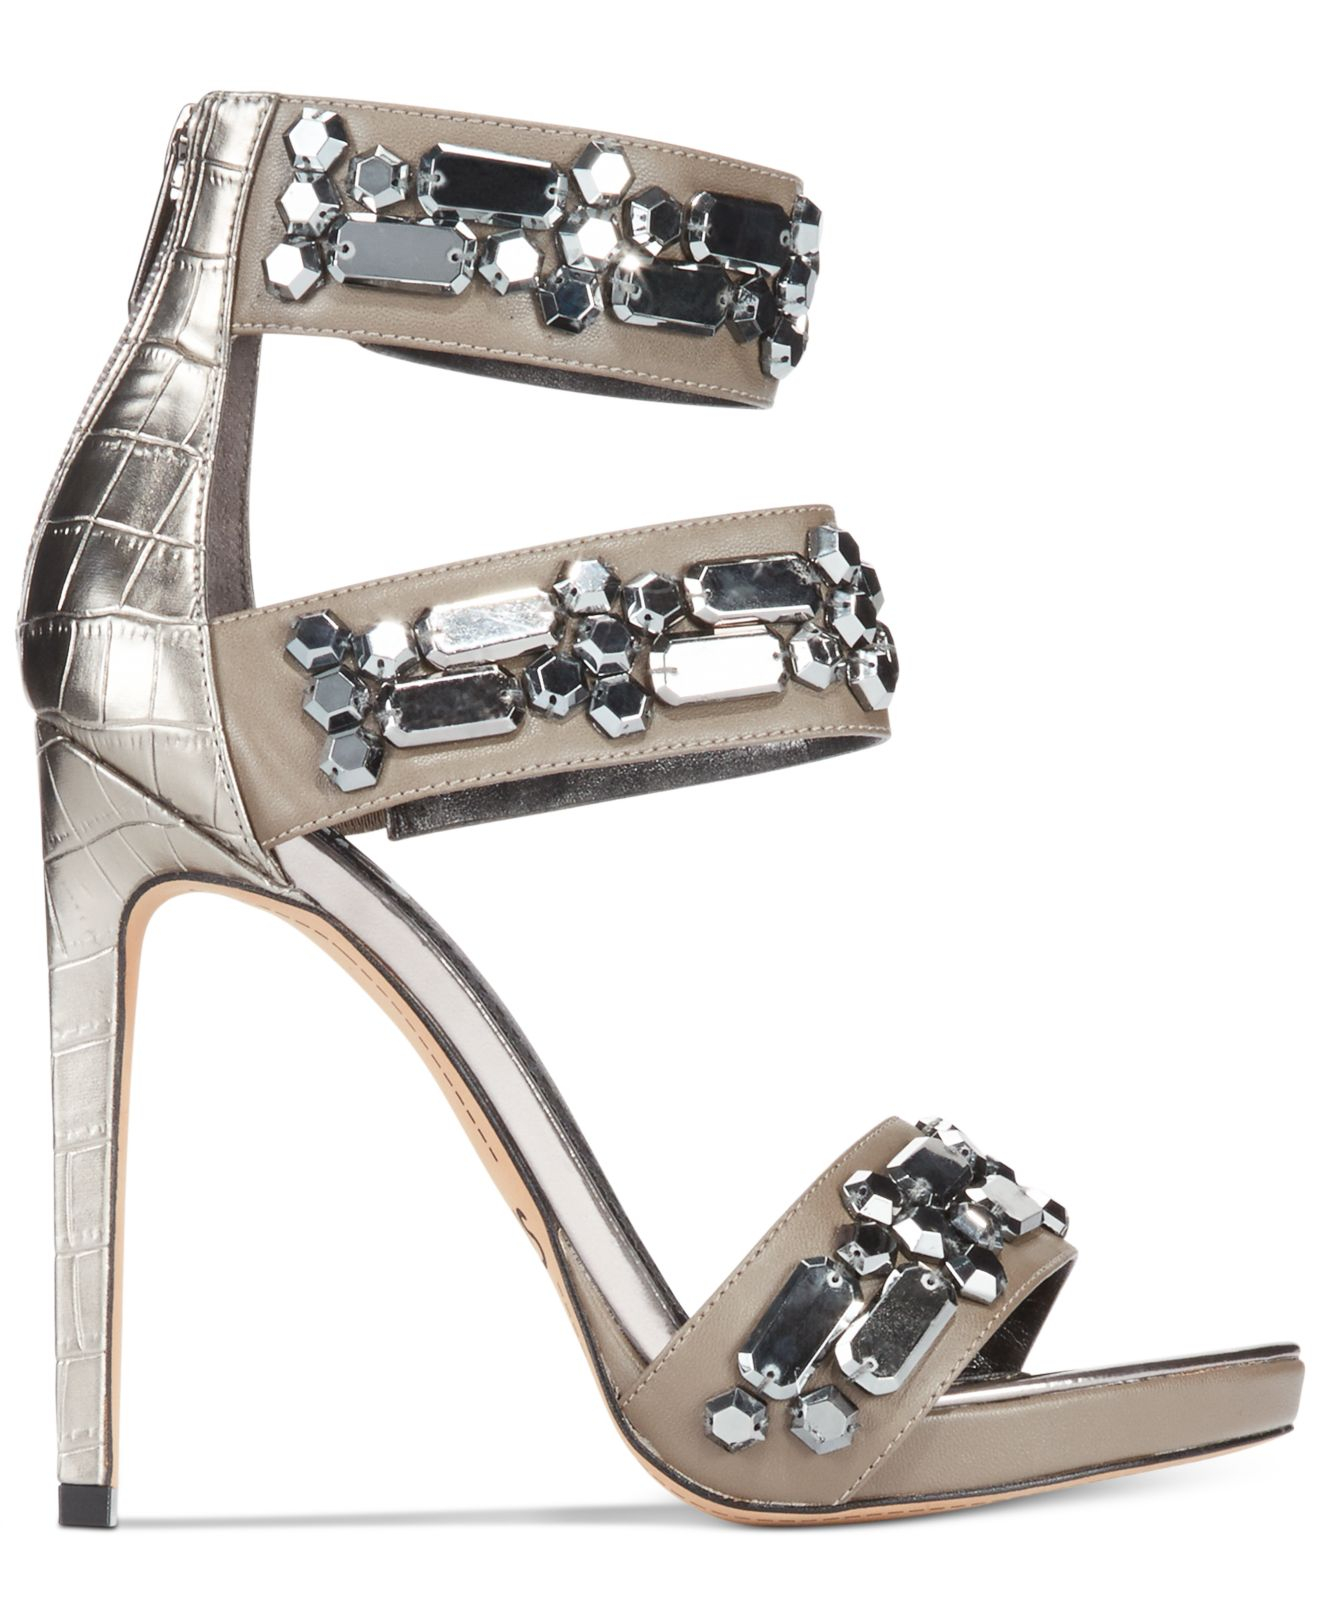 5dfd7e080e5eb8 Lyst - Circus by Sam Edelman Lola Platform High Heel Evening Sandals ...